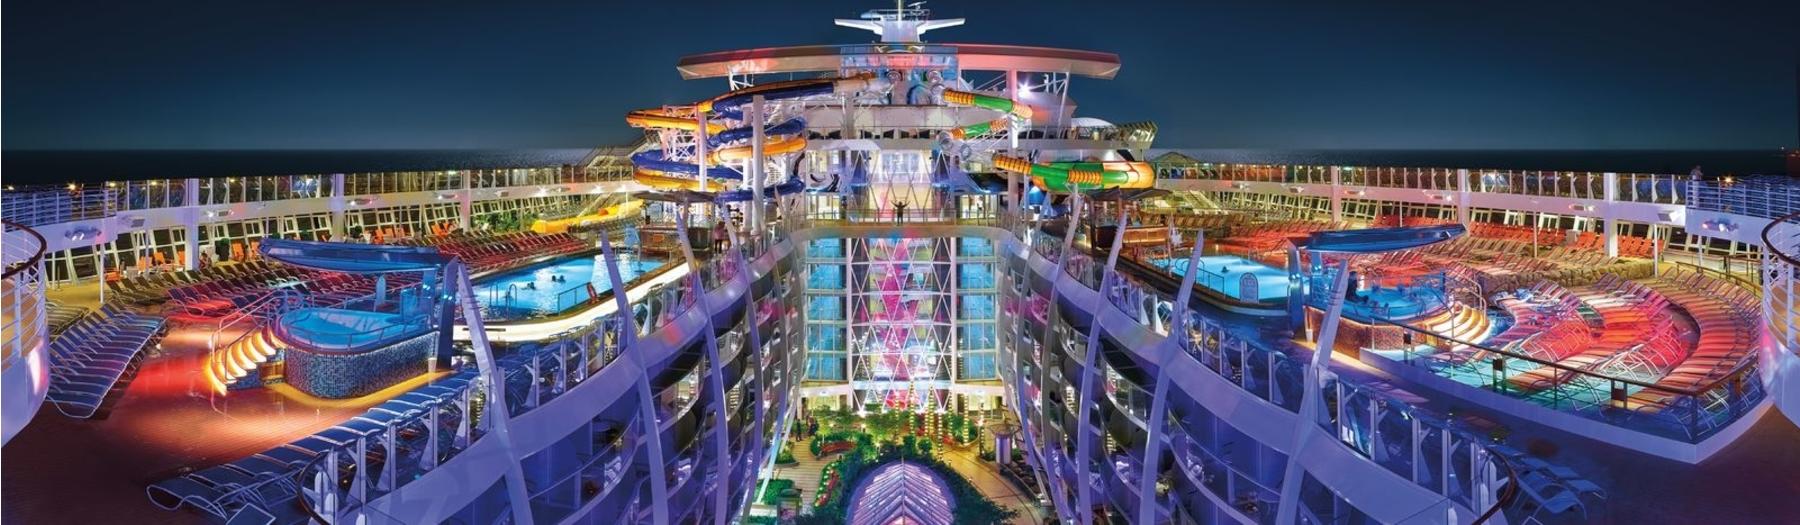 cruise ship aerial night